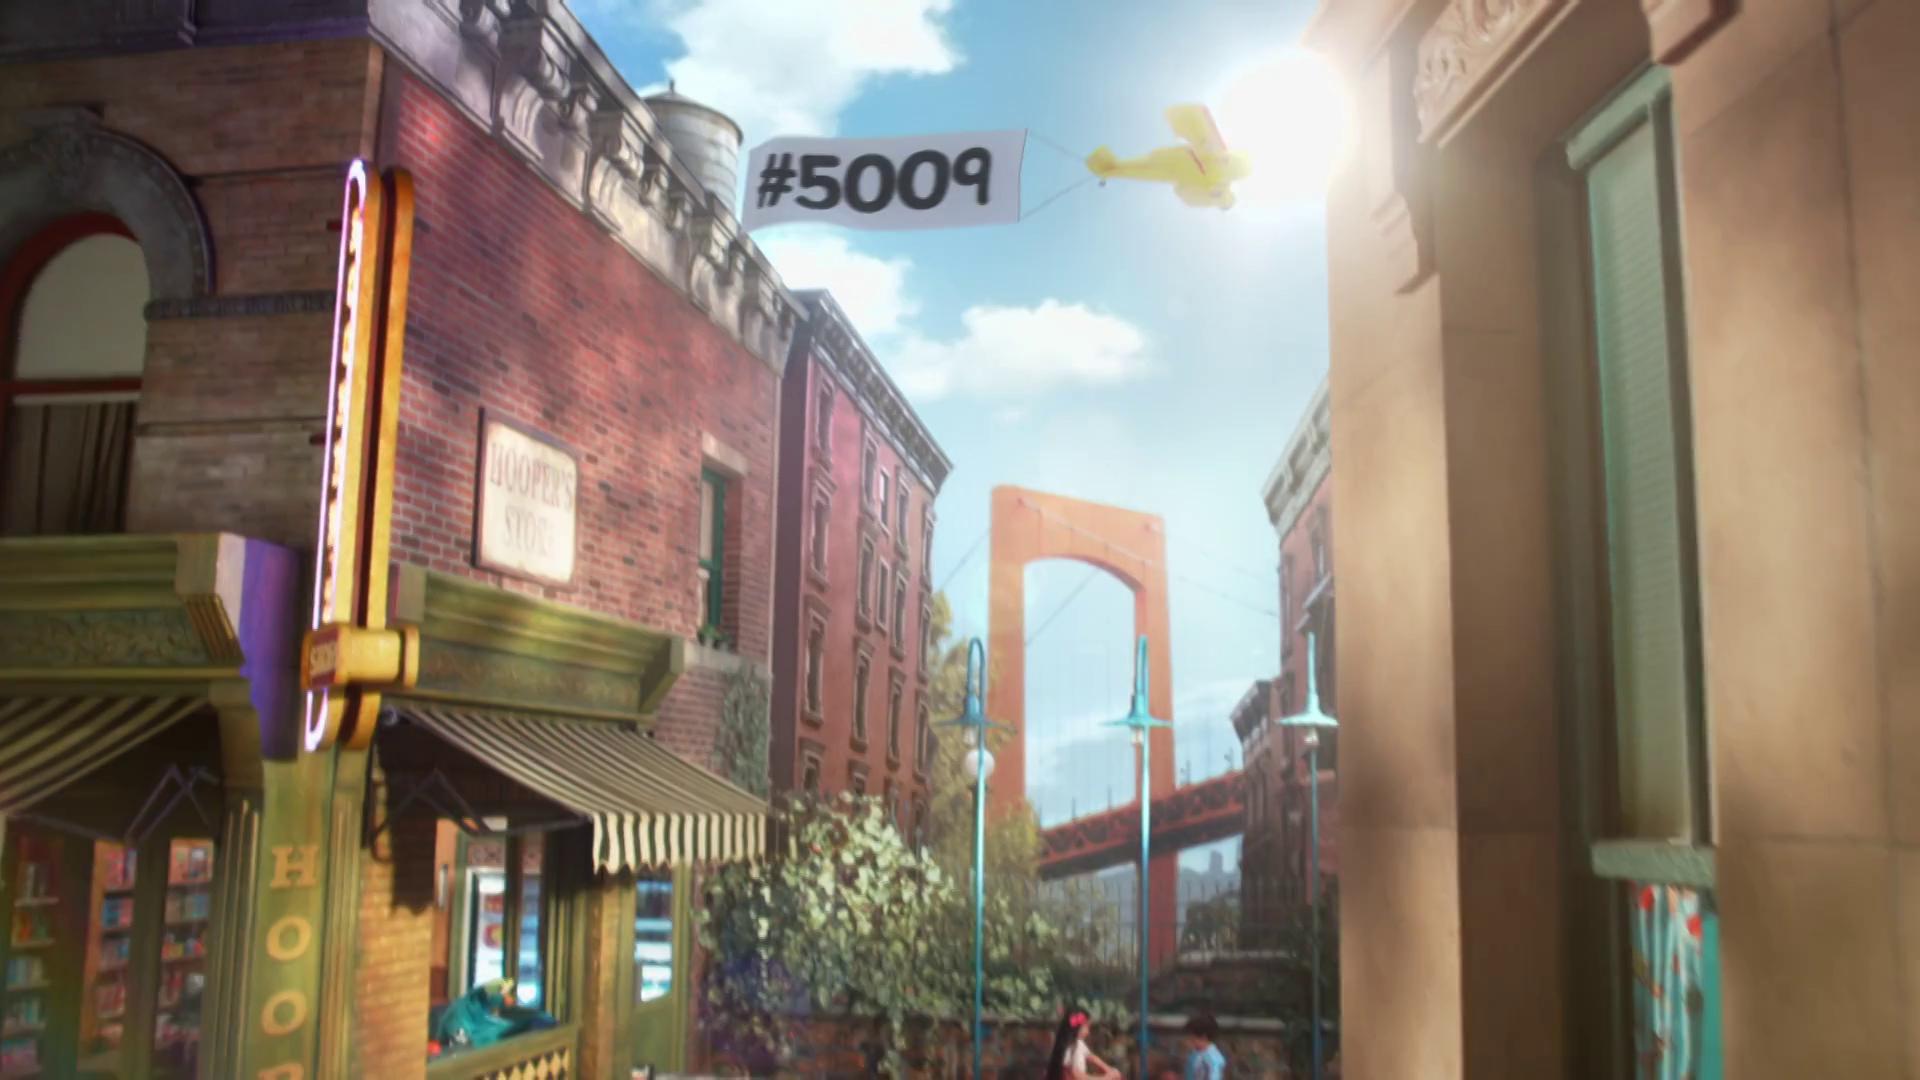 Episode 5009